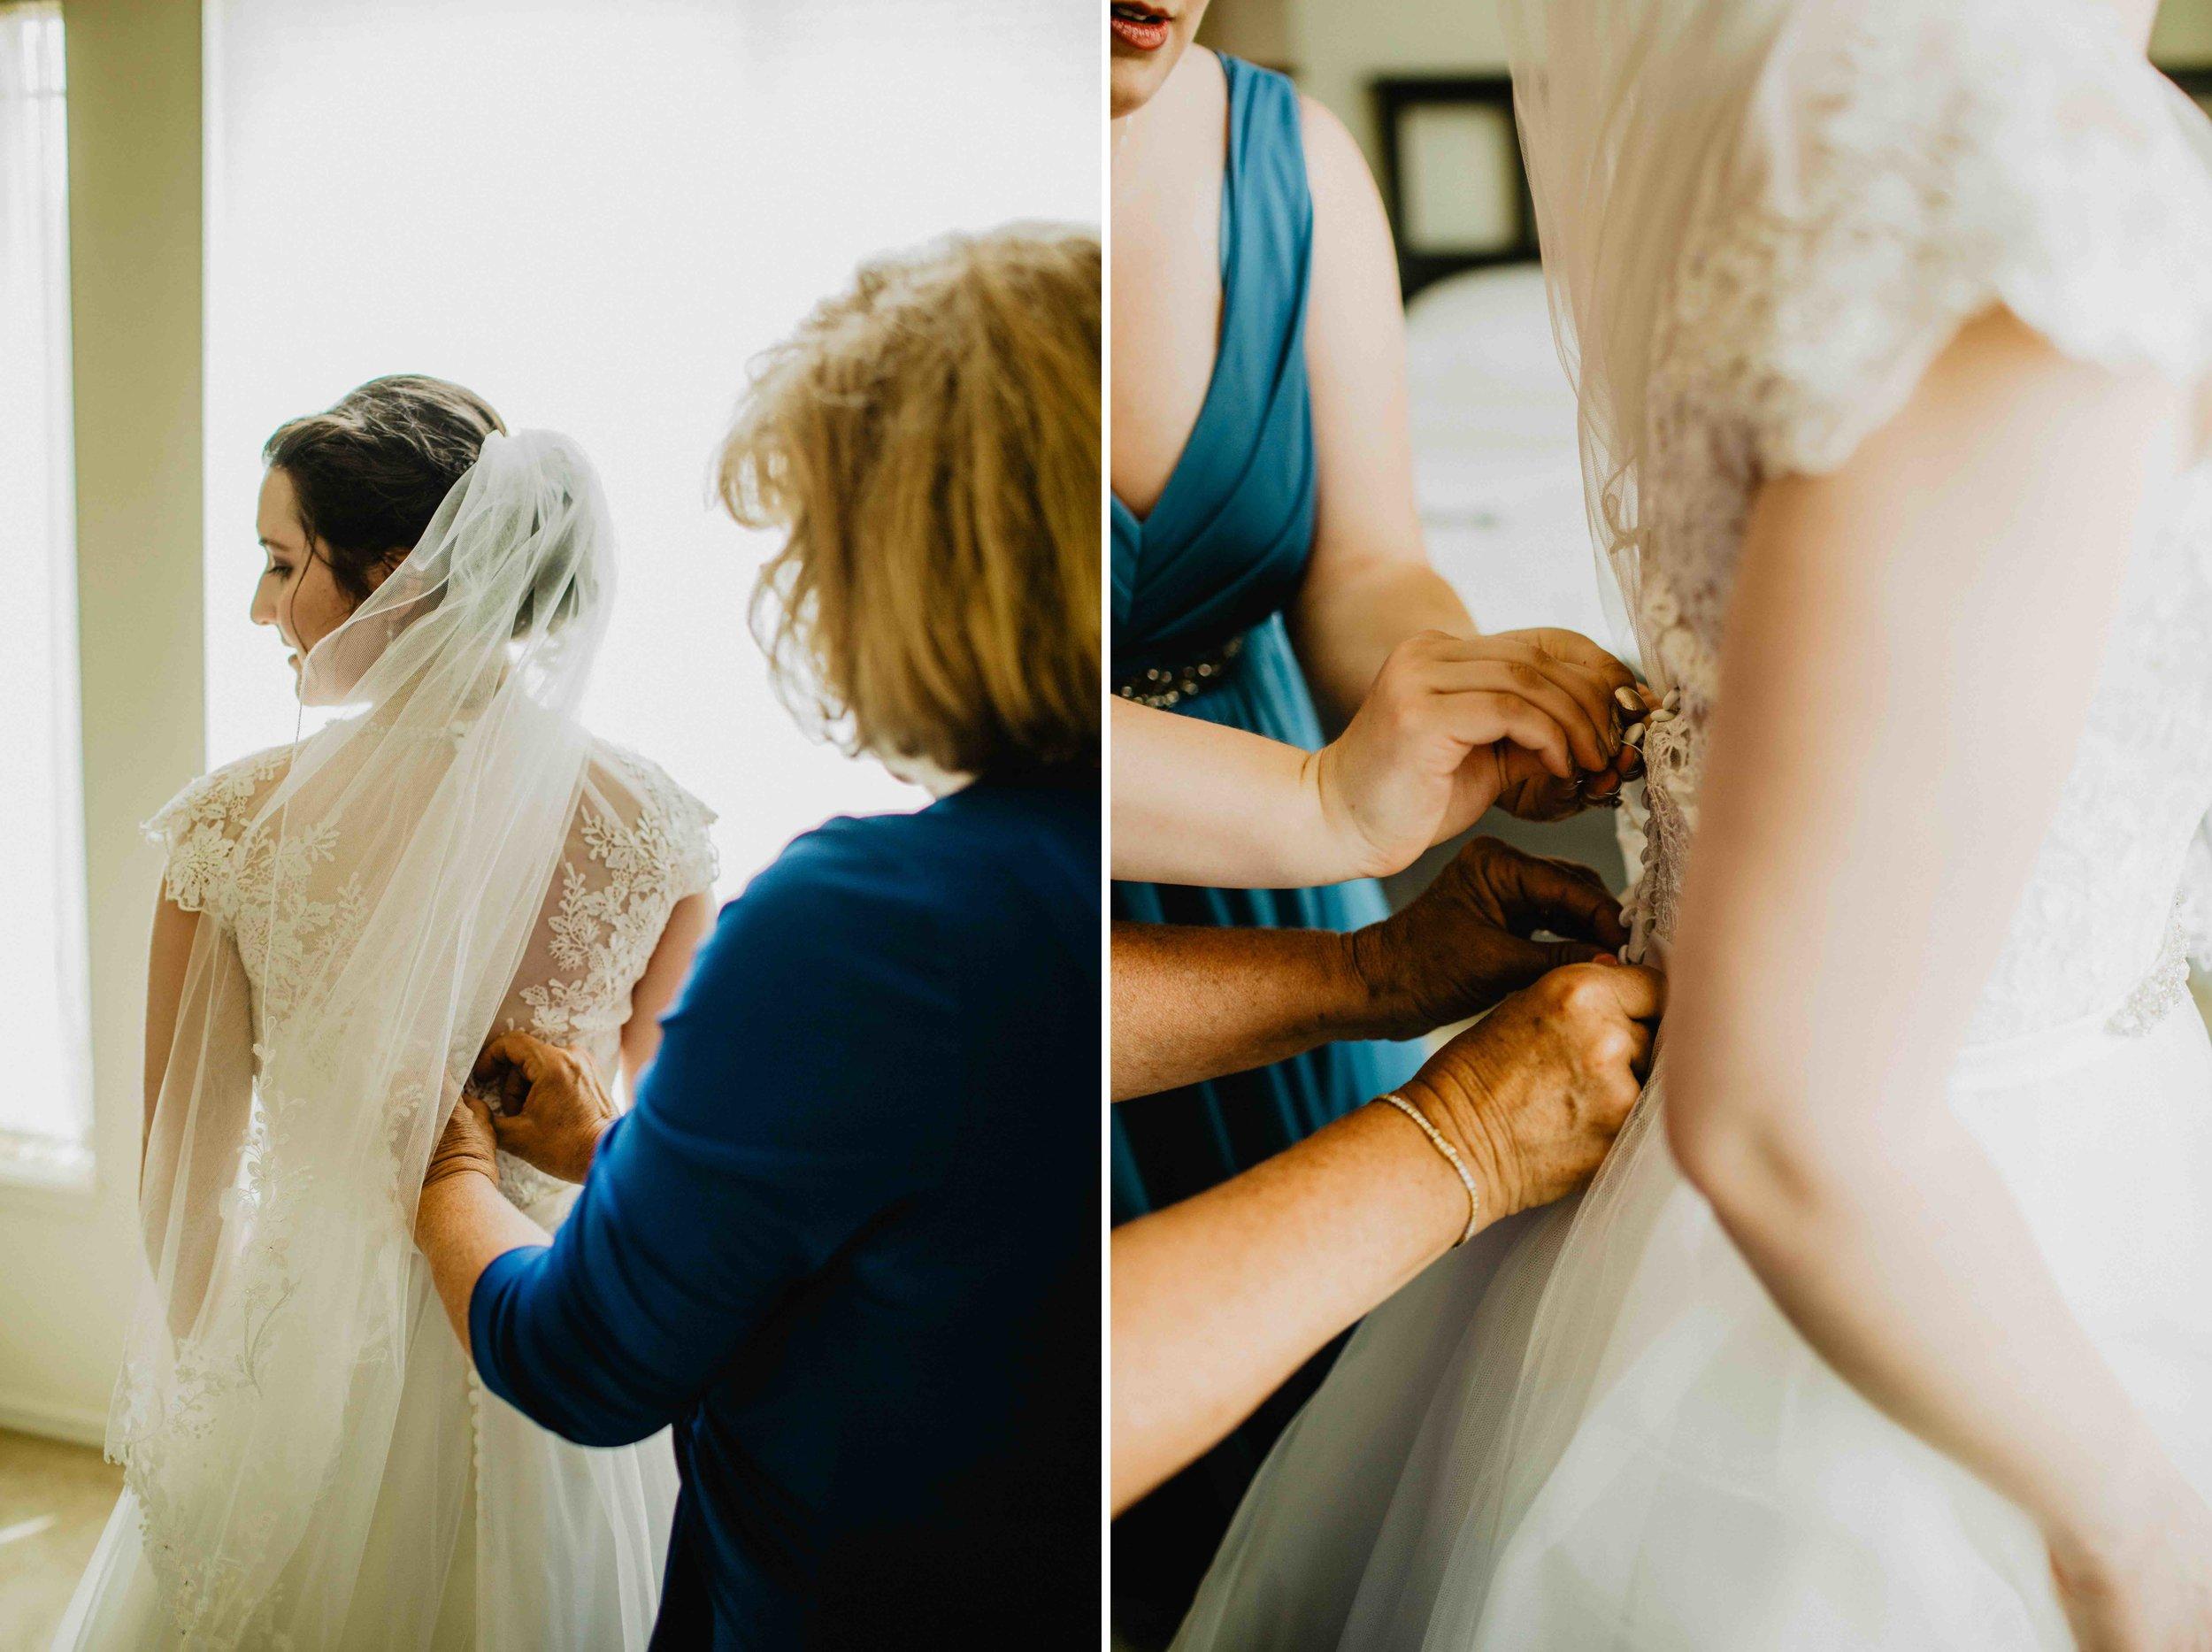 607A5330-colorado-wedding-photographer-denver-springs-vail--colorado-wedding-photographer-denver-springs-vail-.jpeg